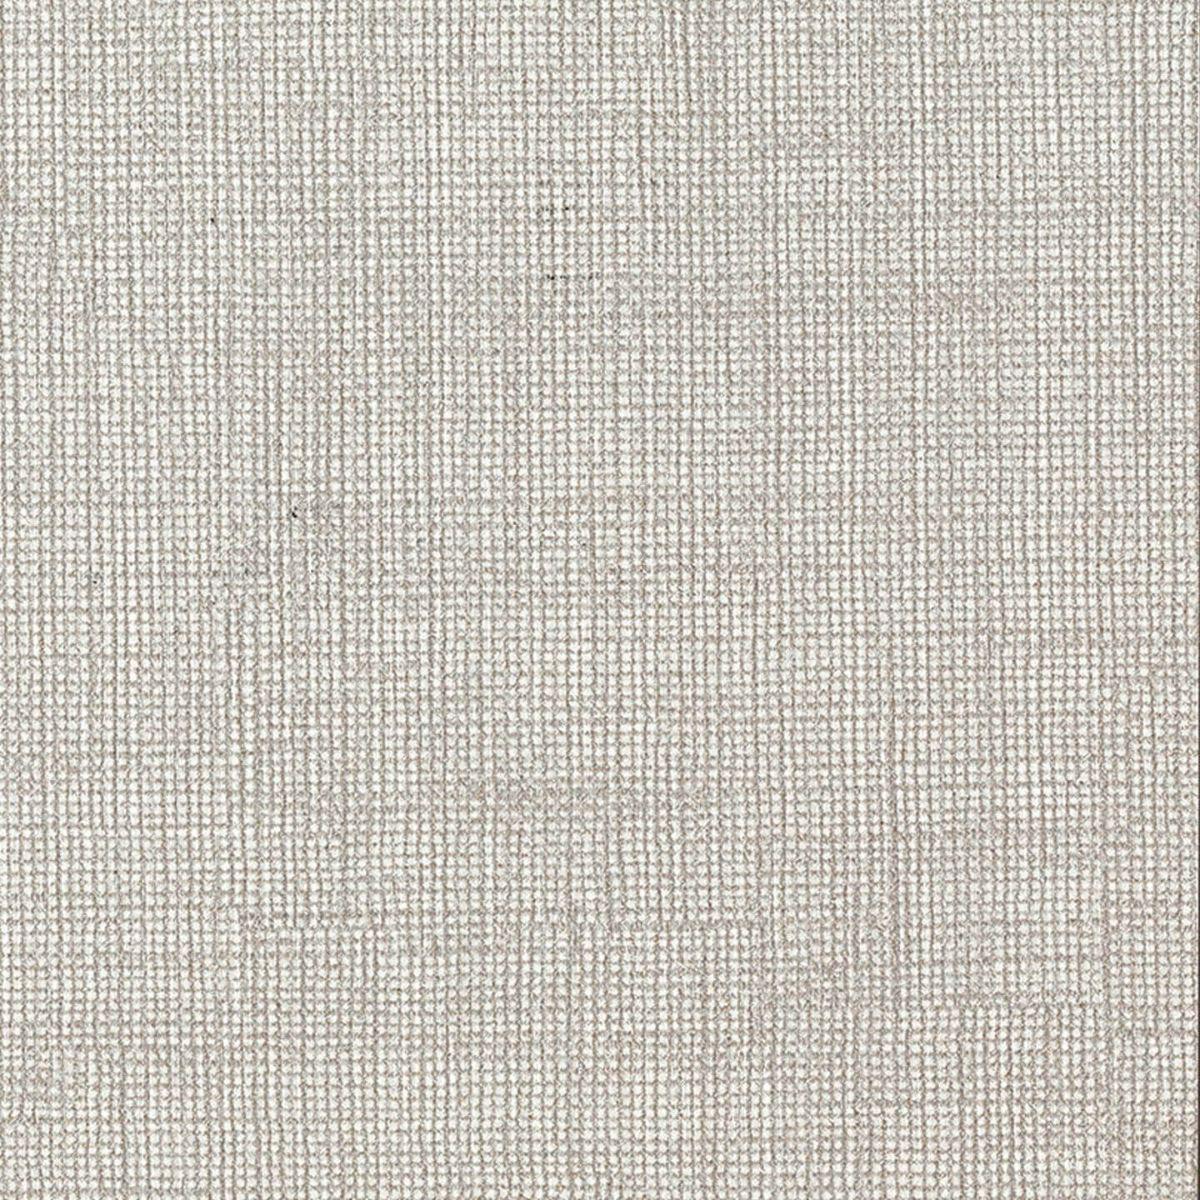 Finish khaki panels penelope for glass wall